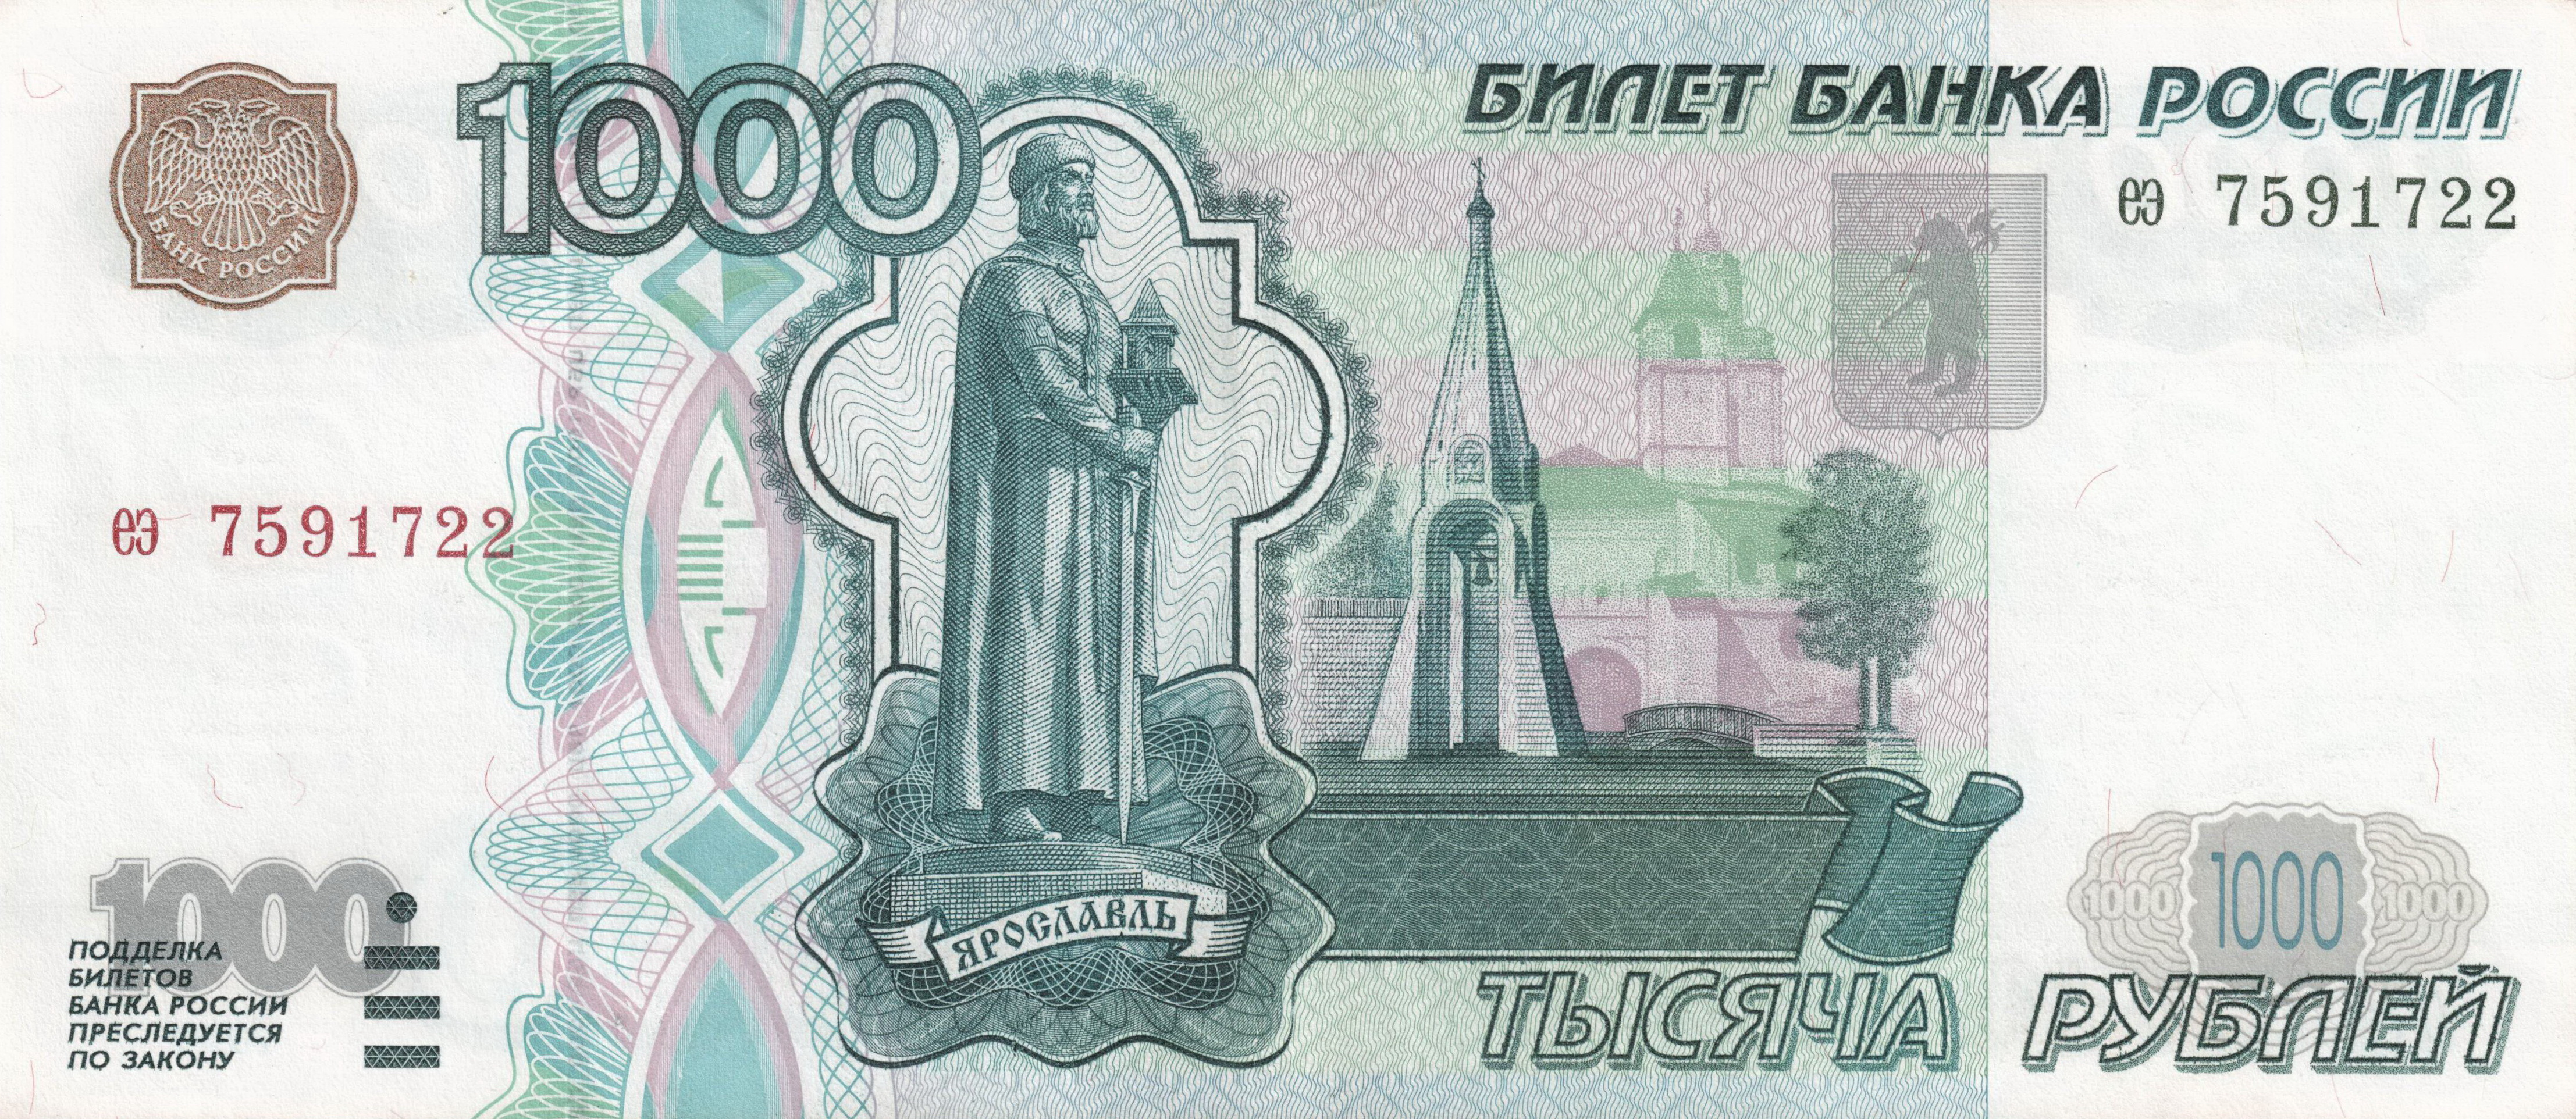 Изображение - Кто изображен на 1000 рублевой купюре Banknote_1000_rubles_%281997%29_front